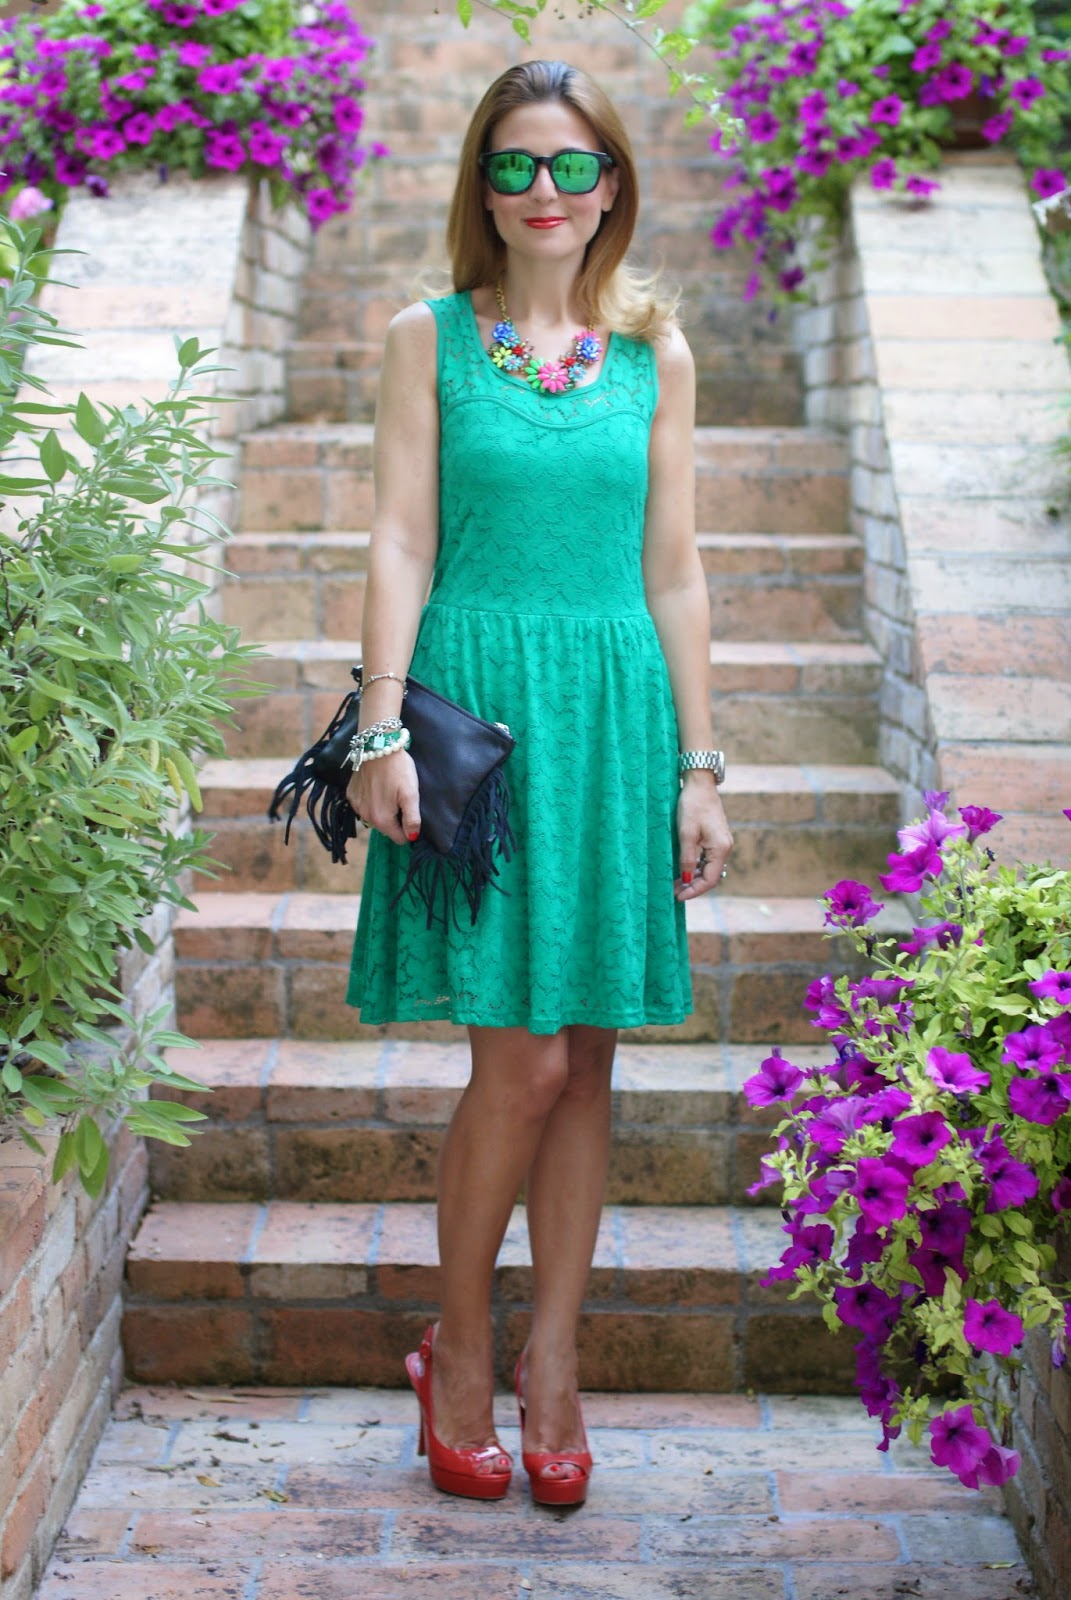 Morgan de toi lace dress, castaner heels, fringed bag, tropical bob hat, oakley green sunglasses, Fashion and Cookies, fashion blogger